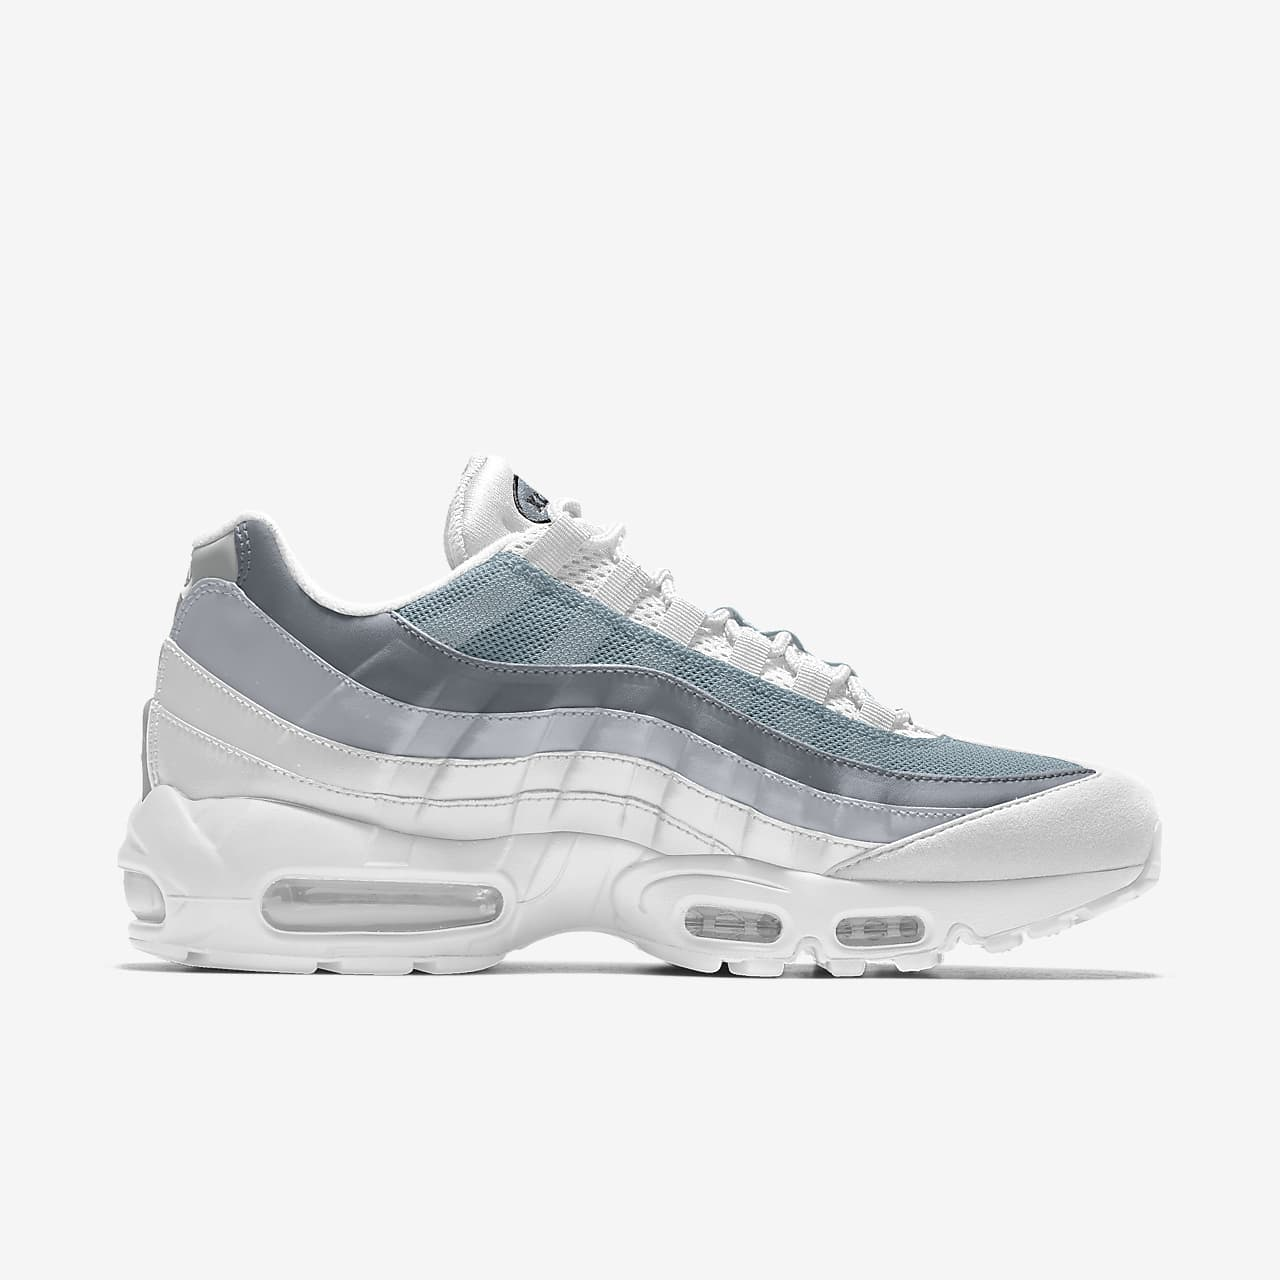 Nike Air Max 95 iD Winter White Men's Shoe